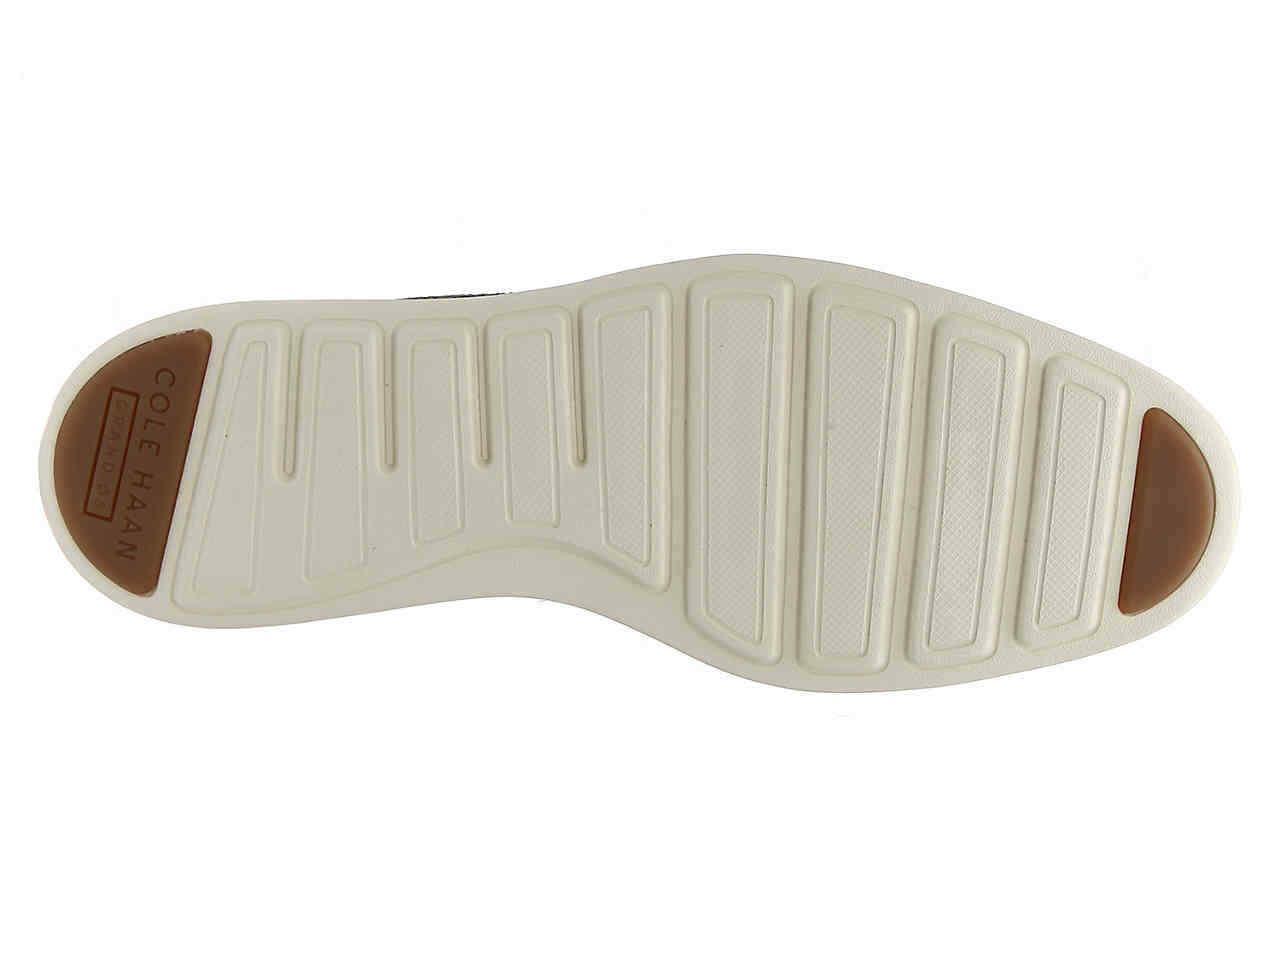 Cole Haan Original Grand StitchLite Wingtip Oxford